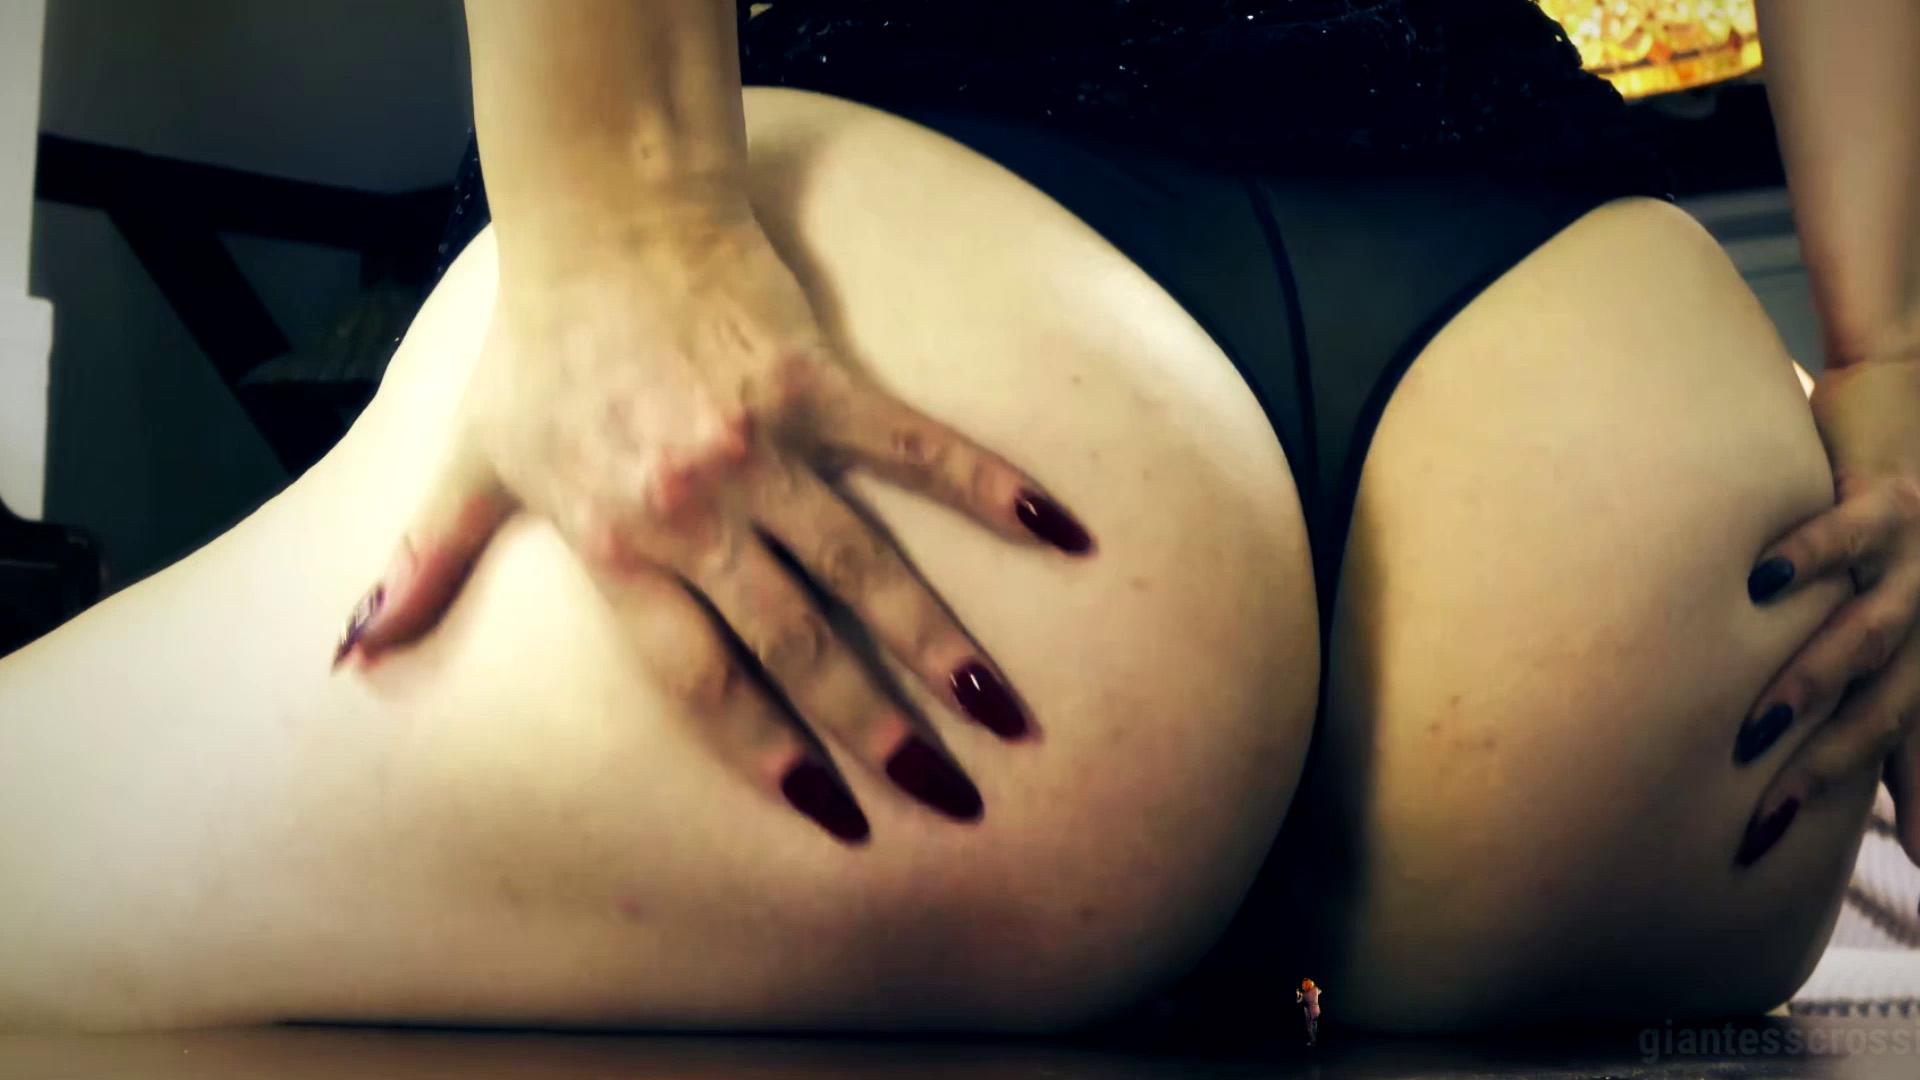 Loryelle Victims of Mean Giantess Enchantress Foot Worship Butt Crush